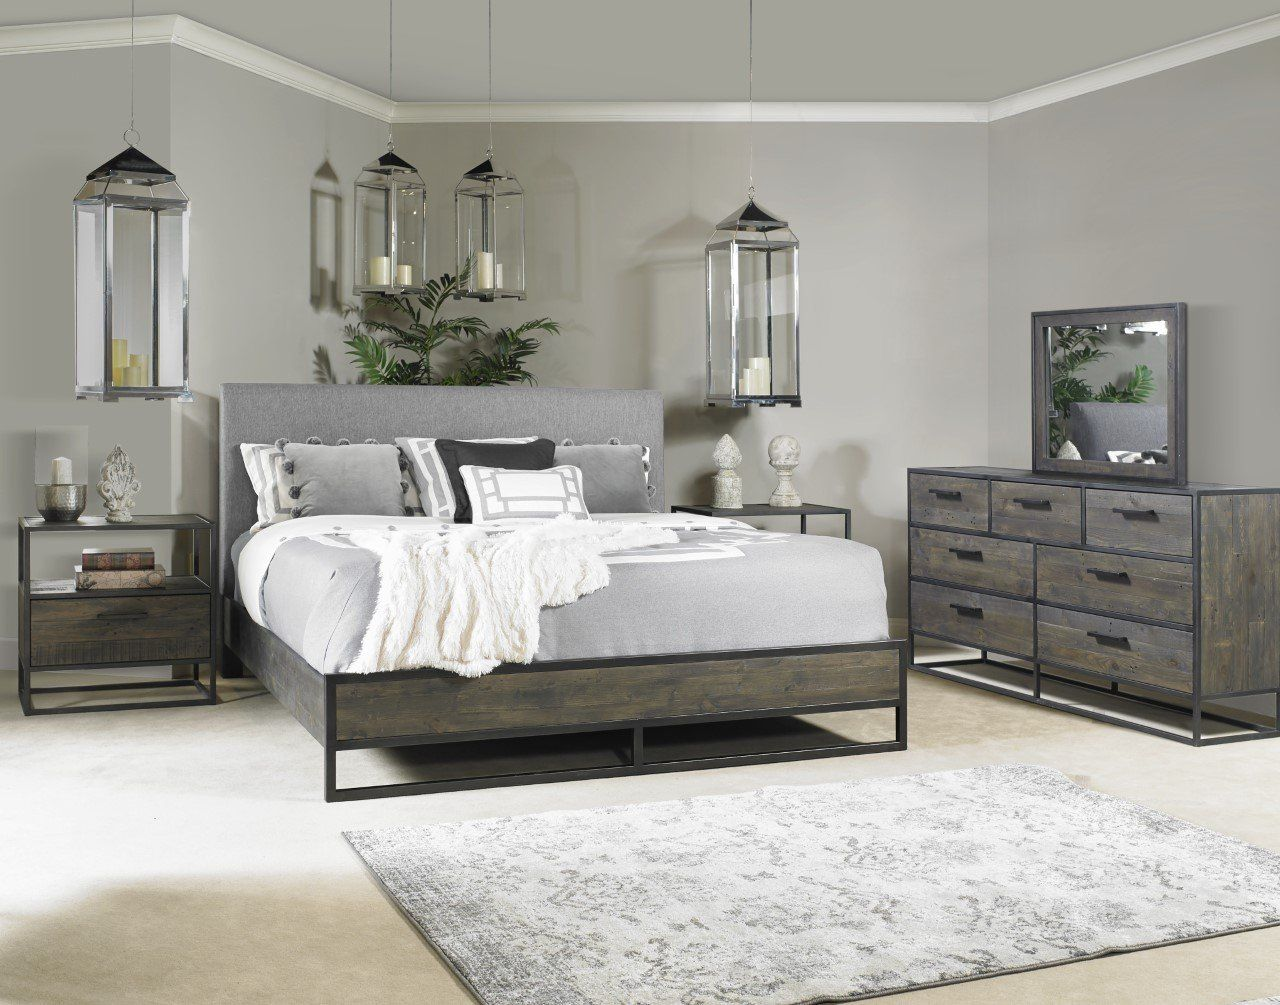 Industrial Gray 4 Piece King Bedroom Set Phuket